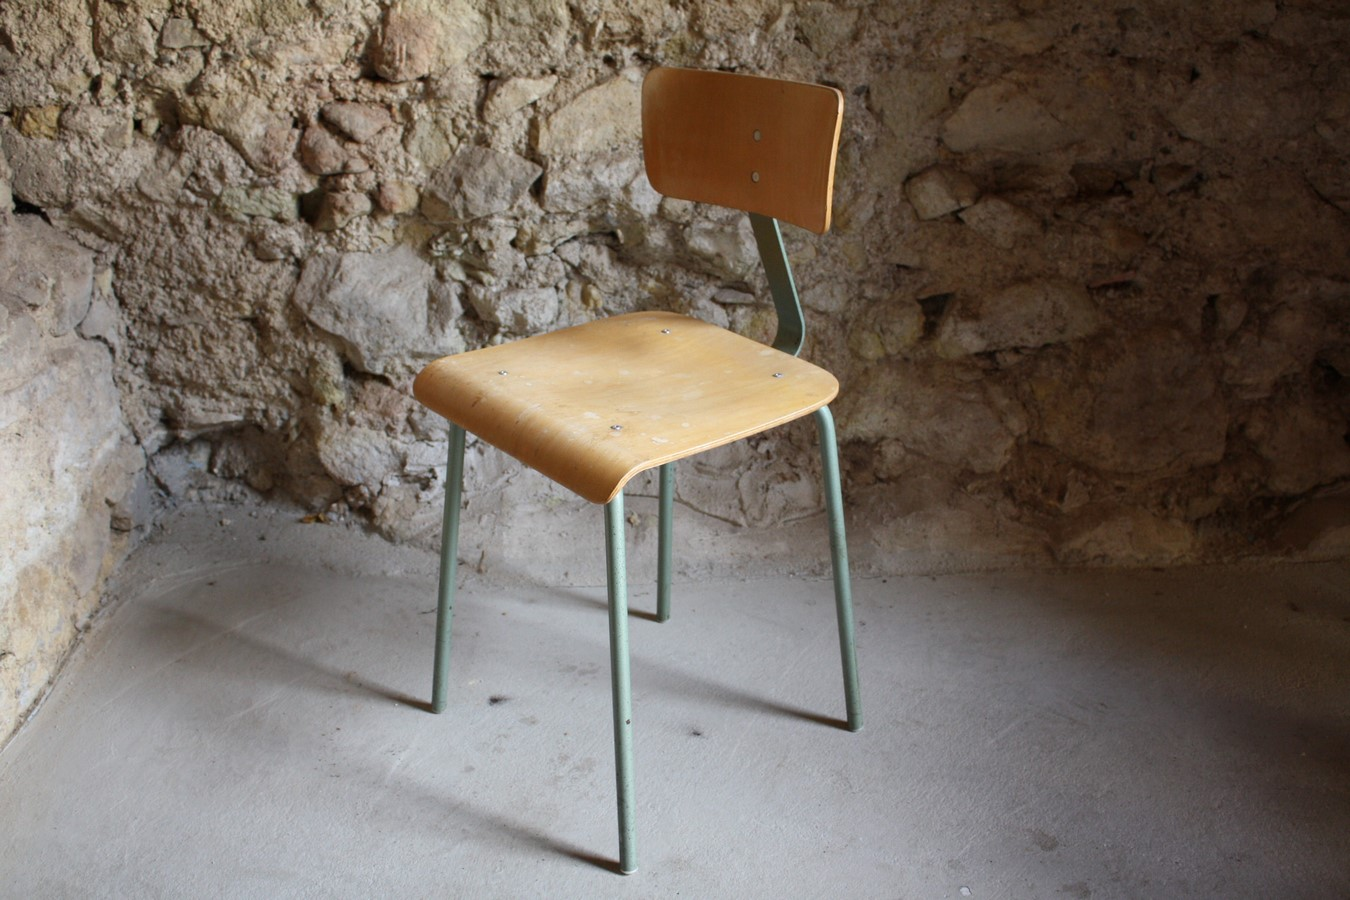 werkstattstuhle-industriestuhle-industrie-design-stuhle-gebraucht-alt-vintage-loft-17